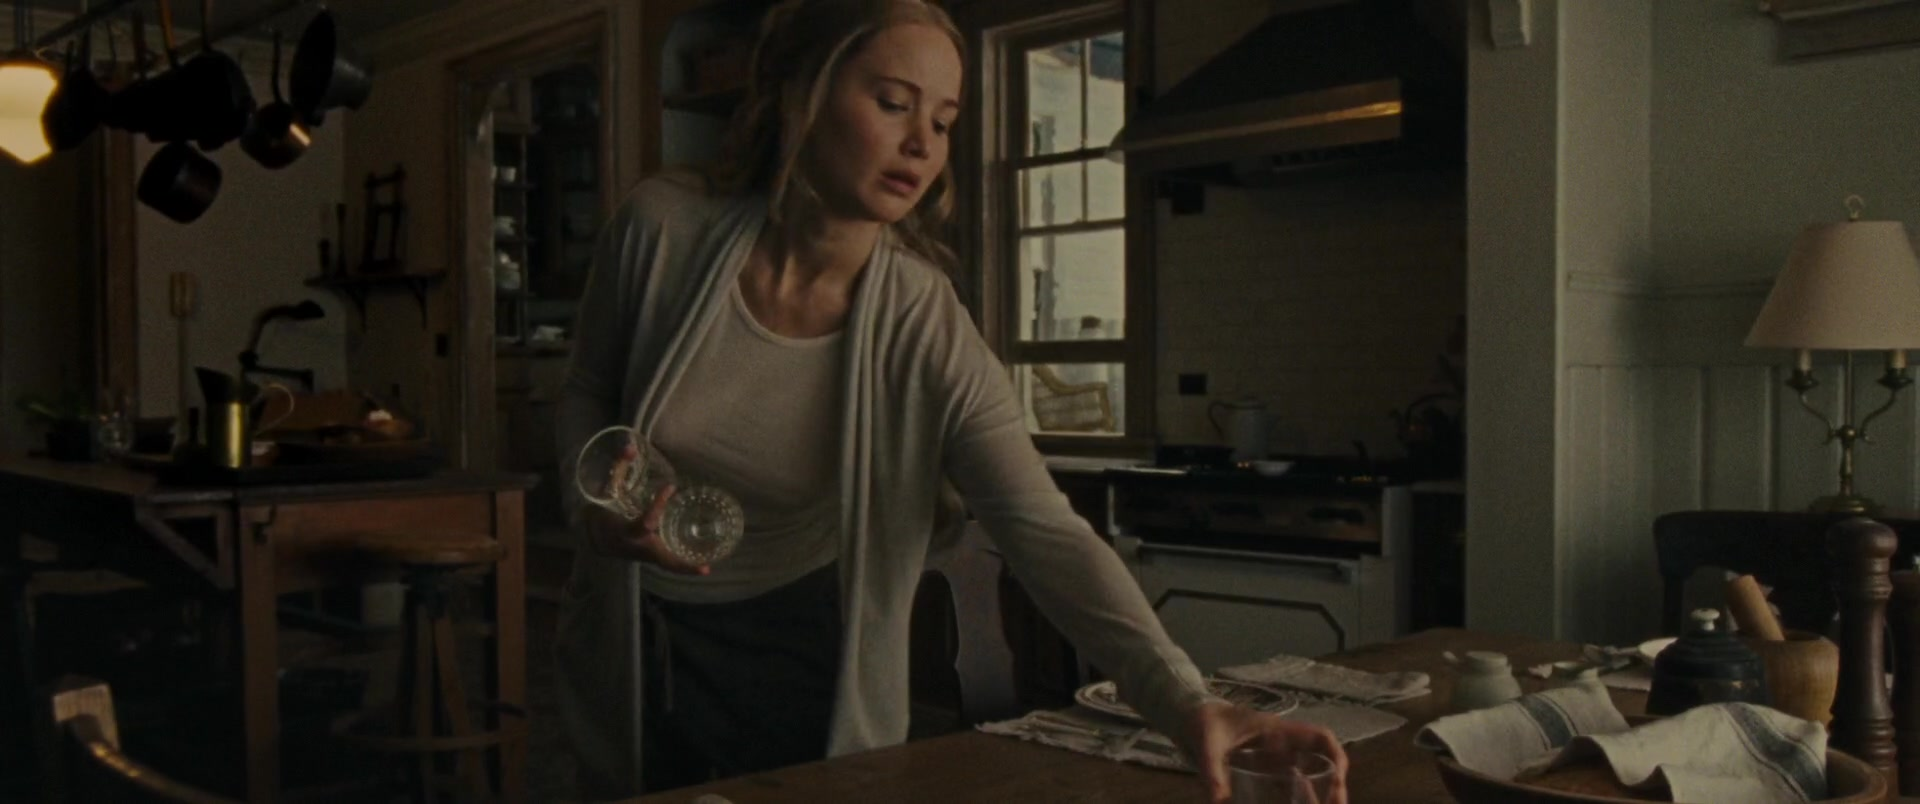 Jennifer-Lawrence-Michelle-Pfeiffer-Mother-15-thefappeningblog.com_.jpg